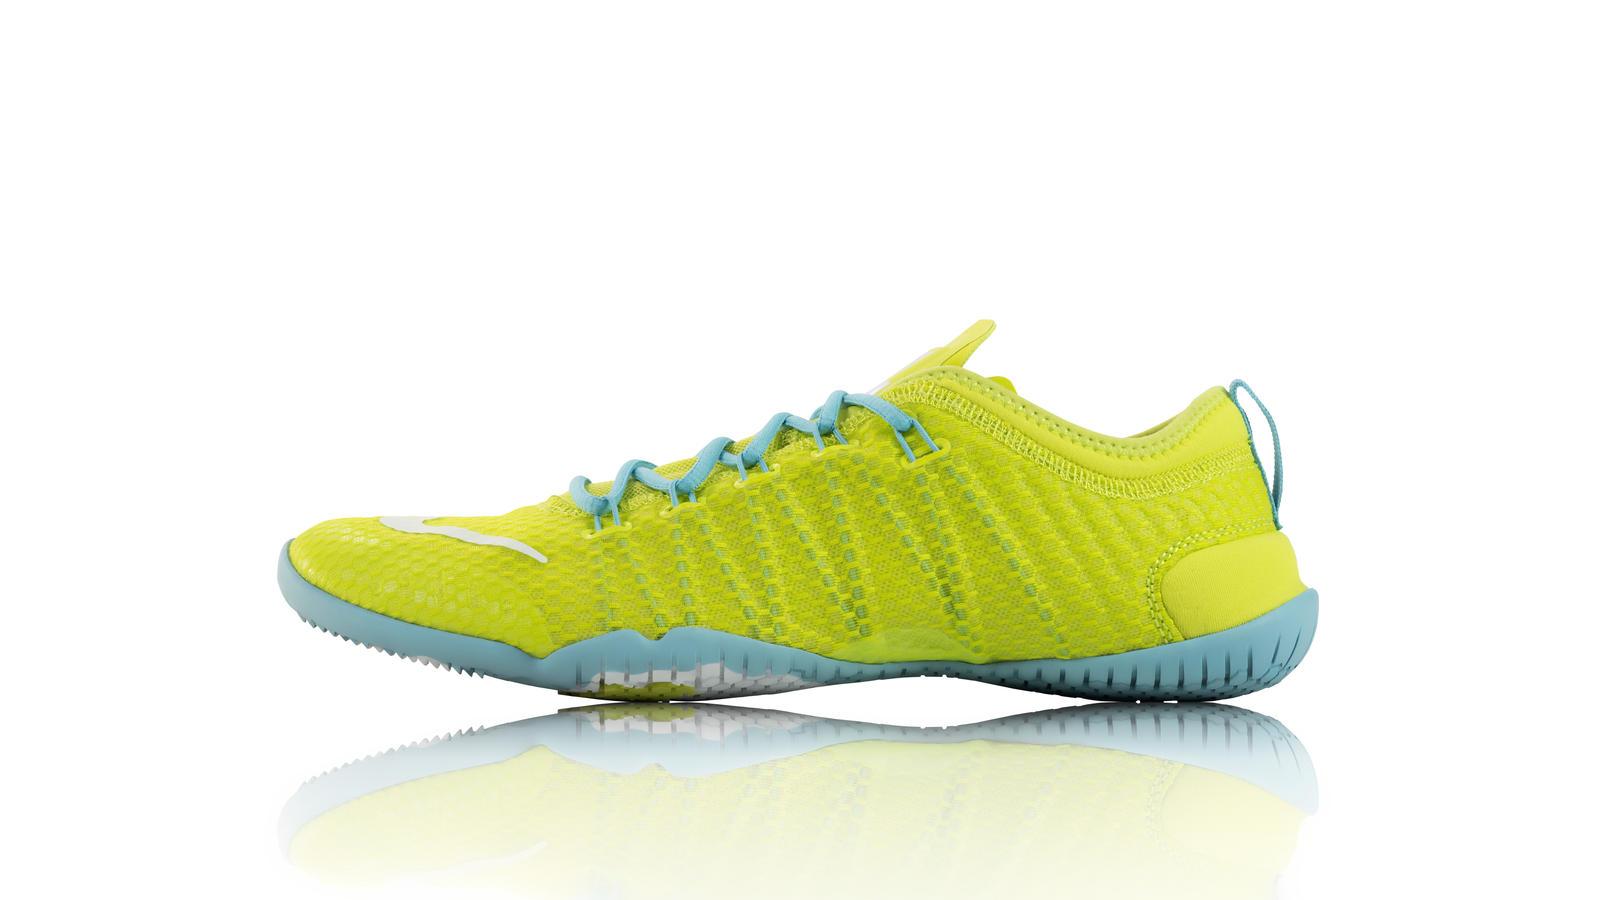 The Nike Free 1.0 Cross Bionic and Nike